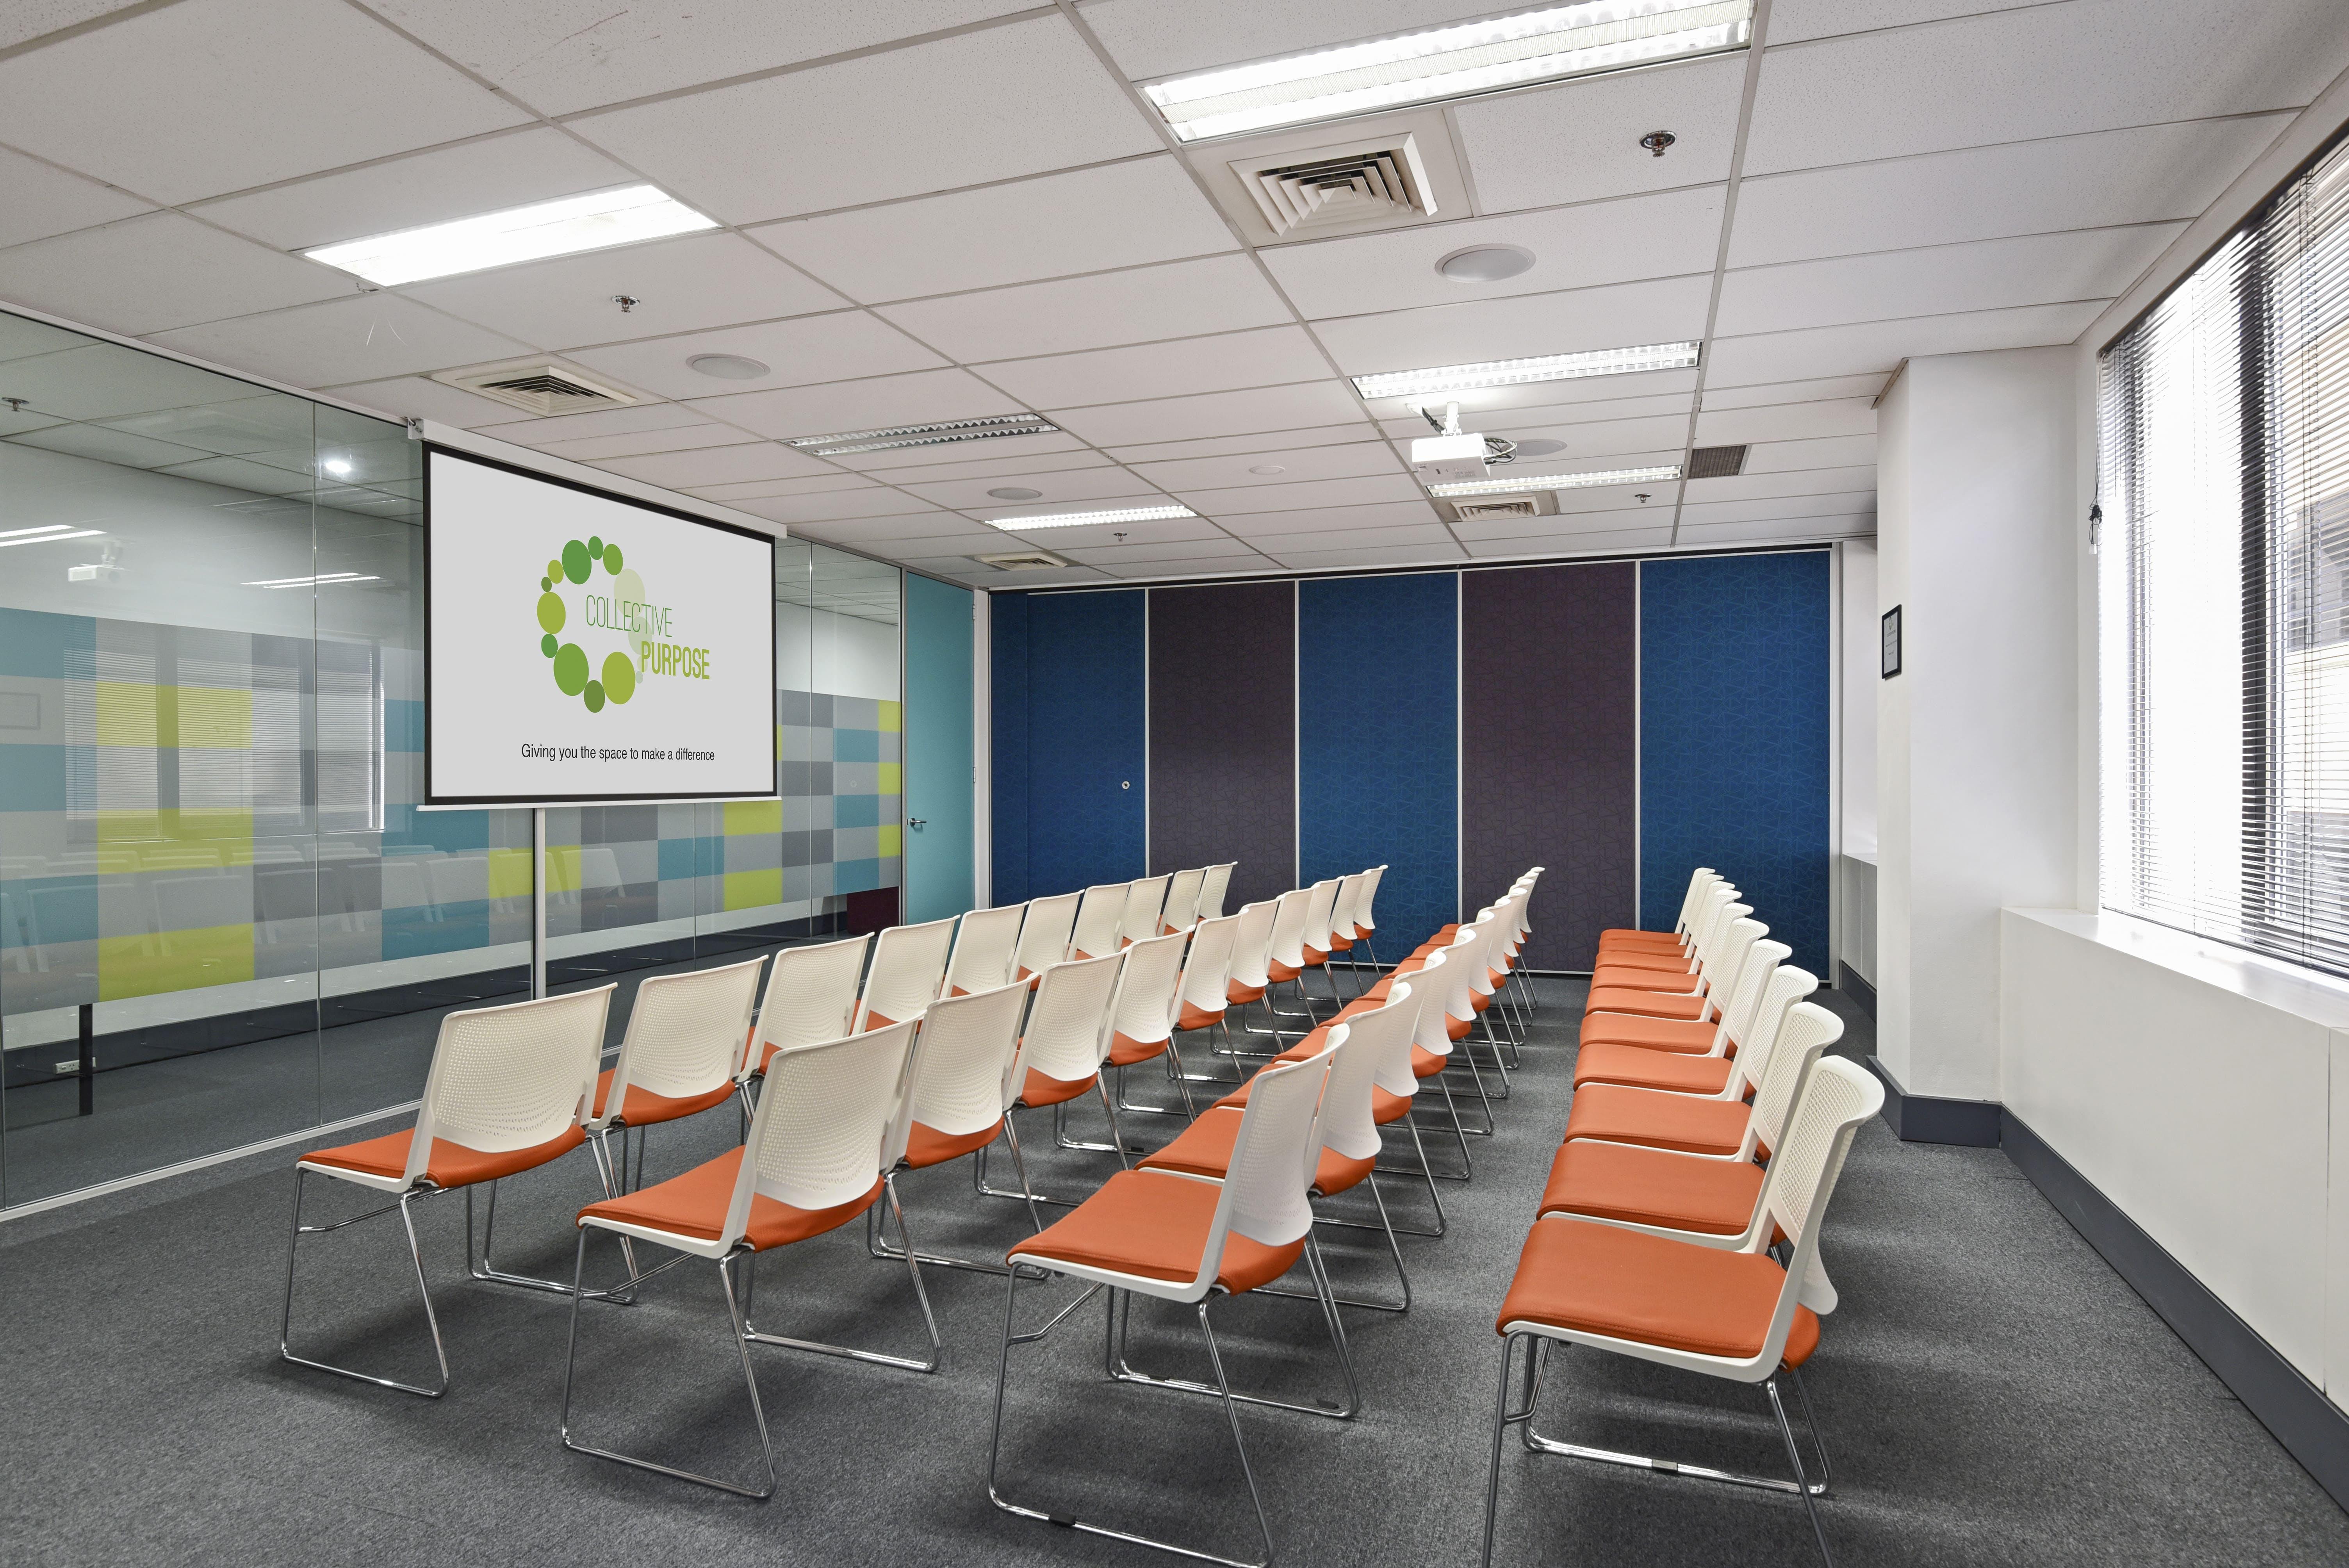 The Namatjira Room, meeting room at Collective Purpose, image 1